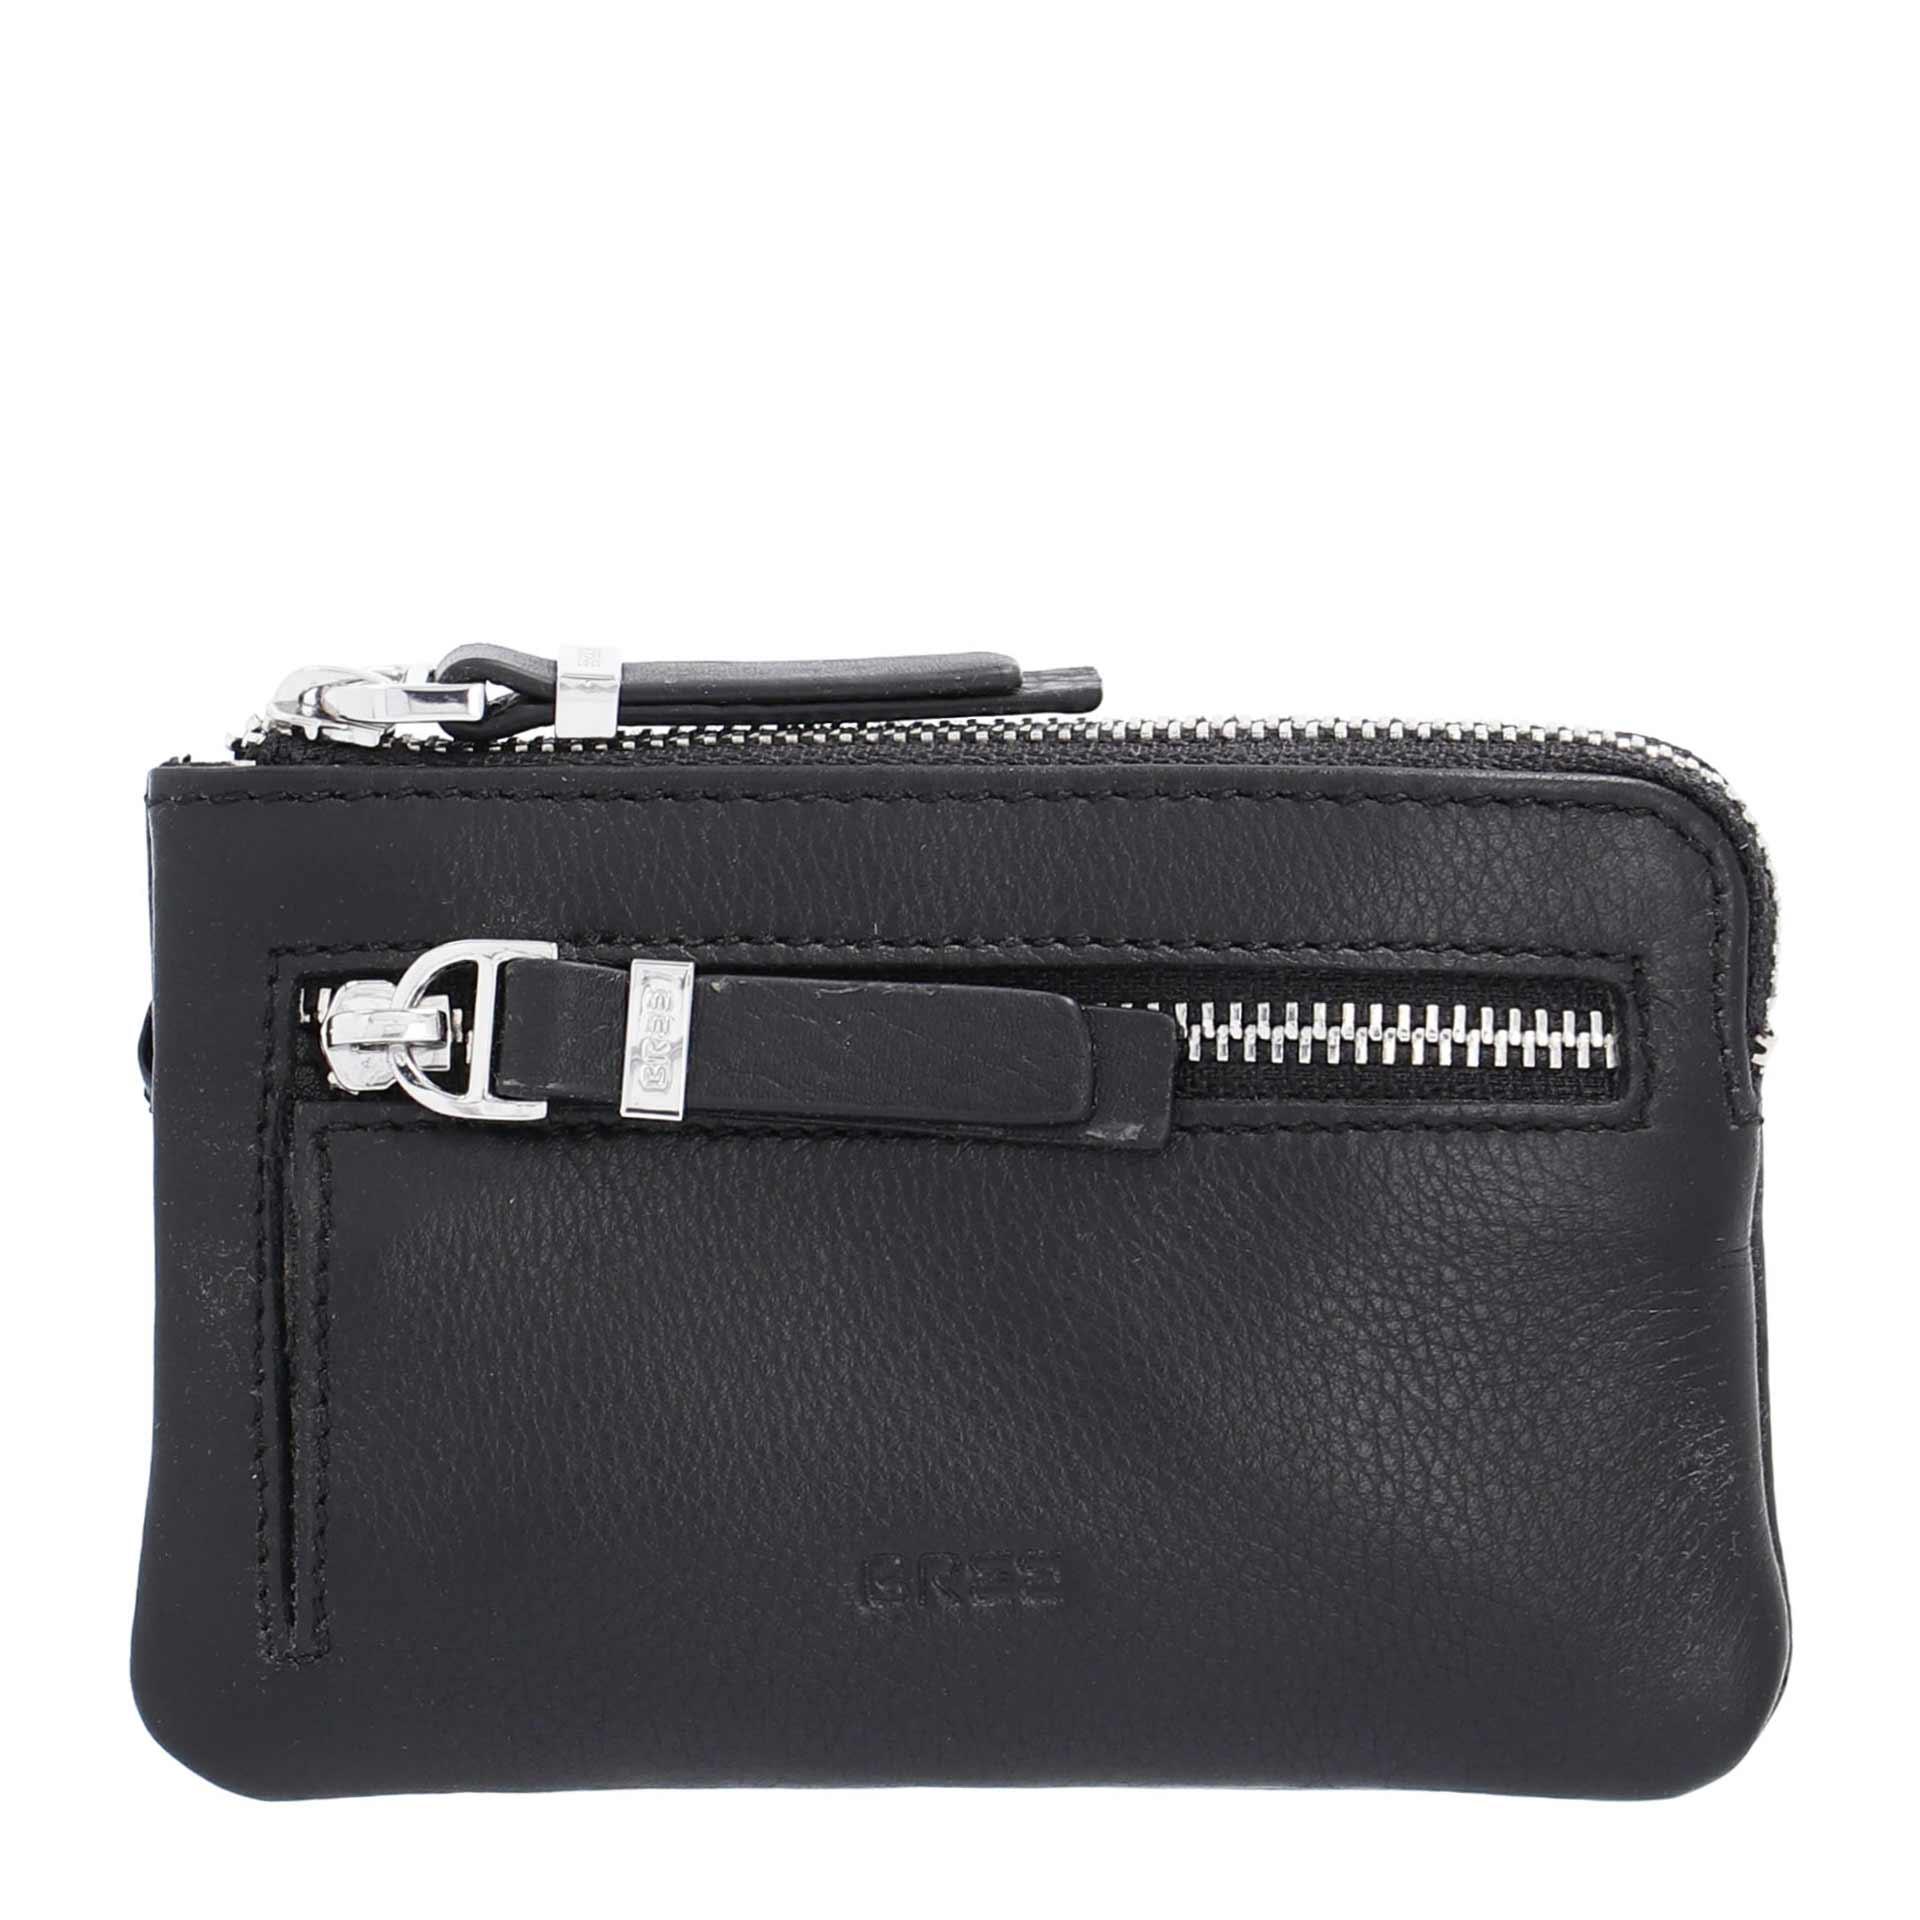 Lynn 159 Schlüsseletui black